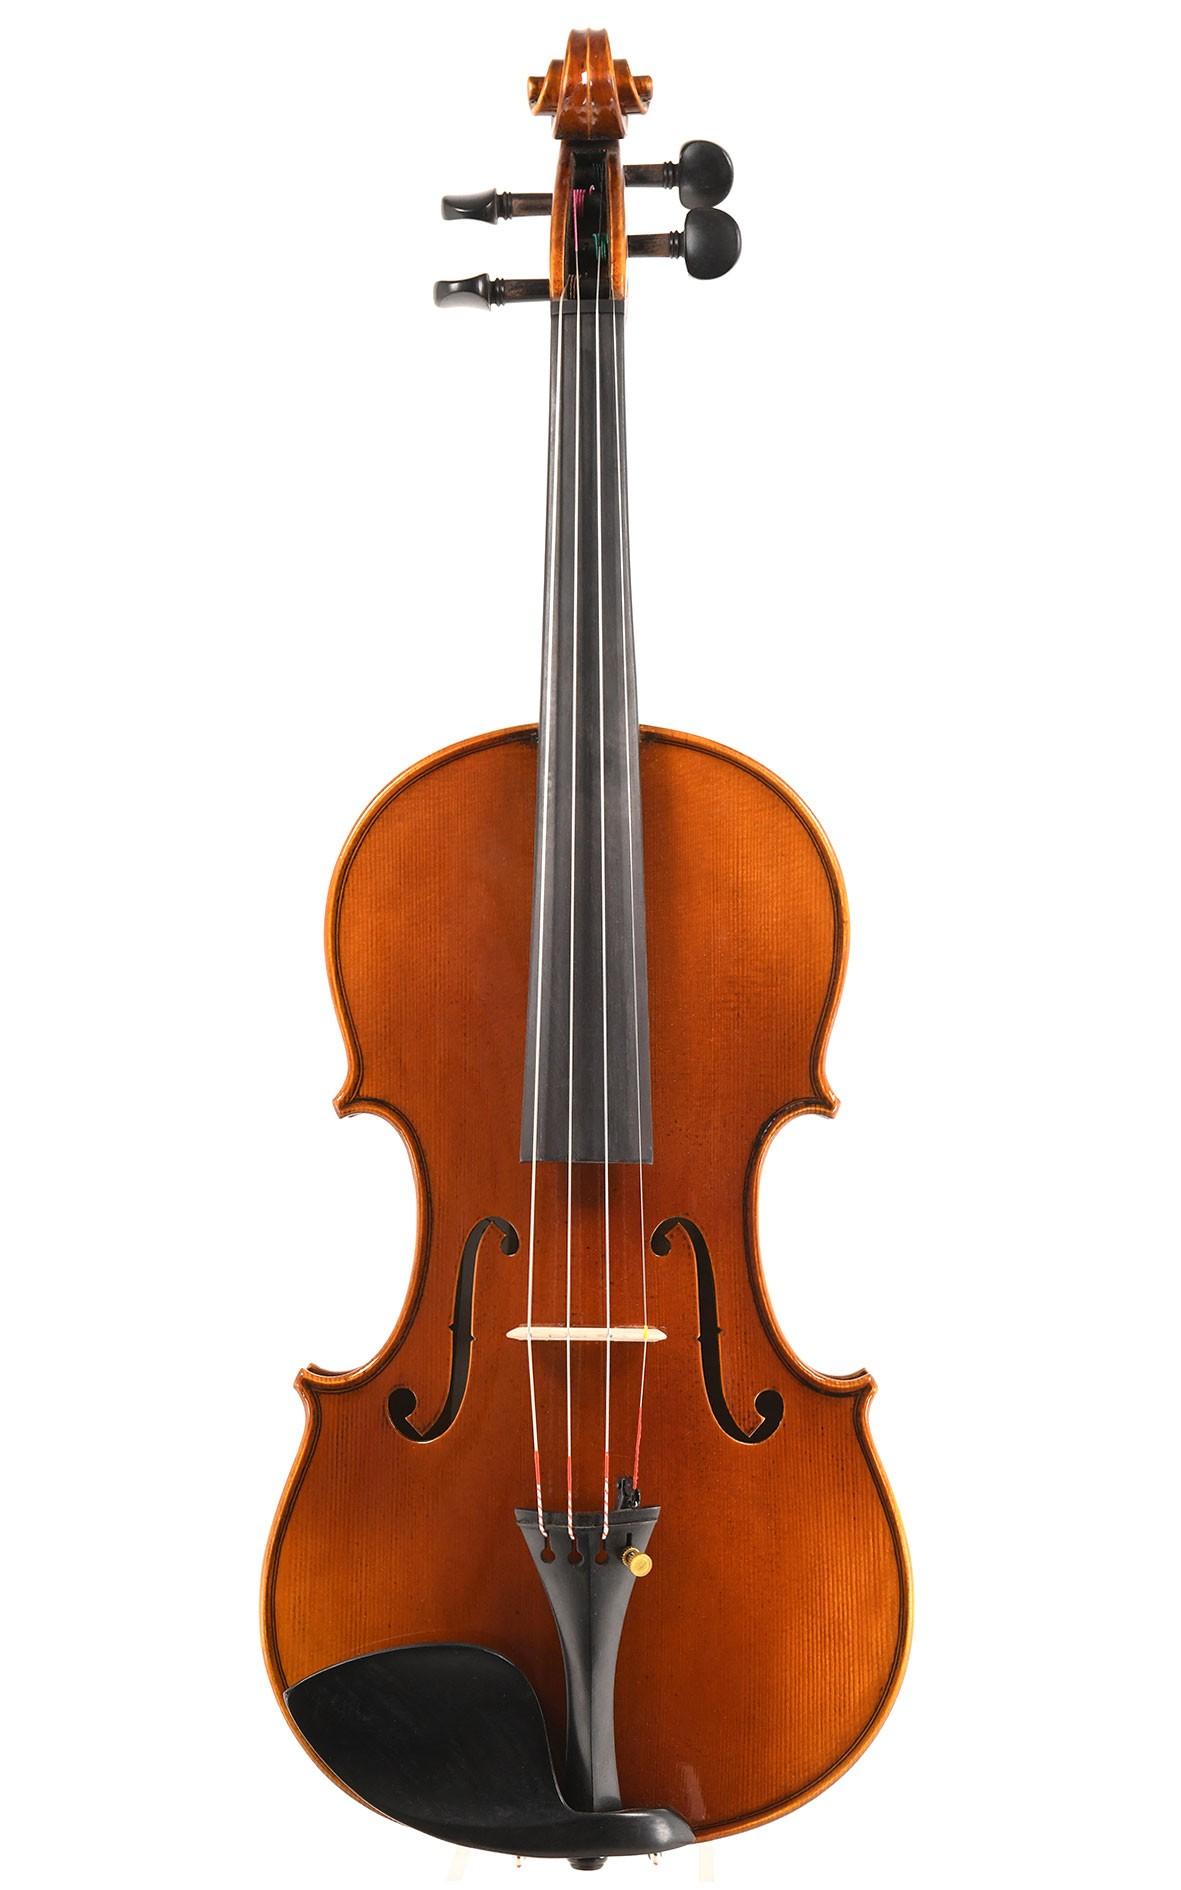 Violin - handmade Stradivarius model (Set)